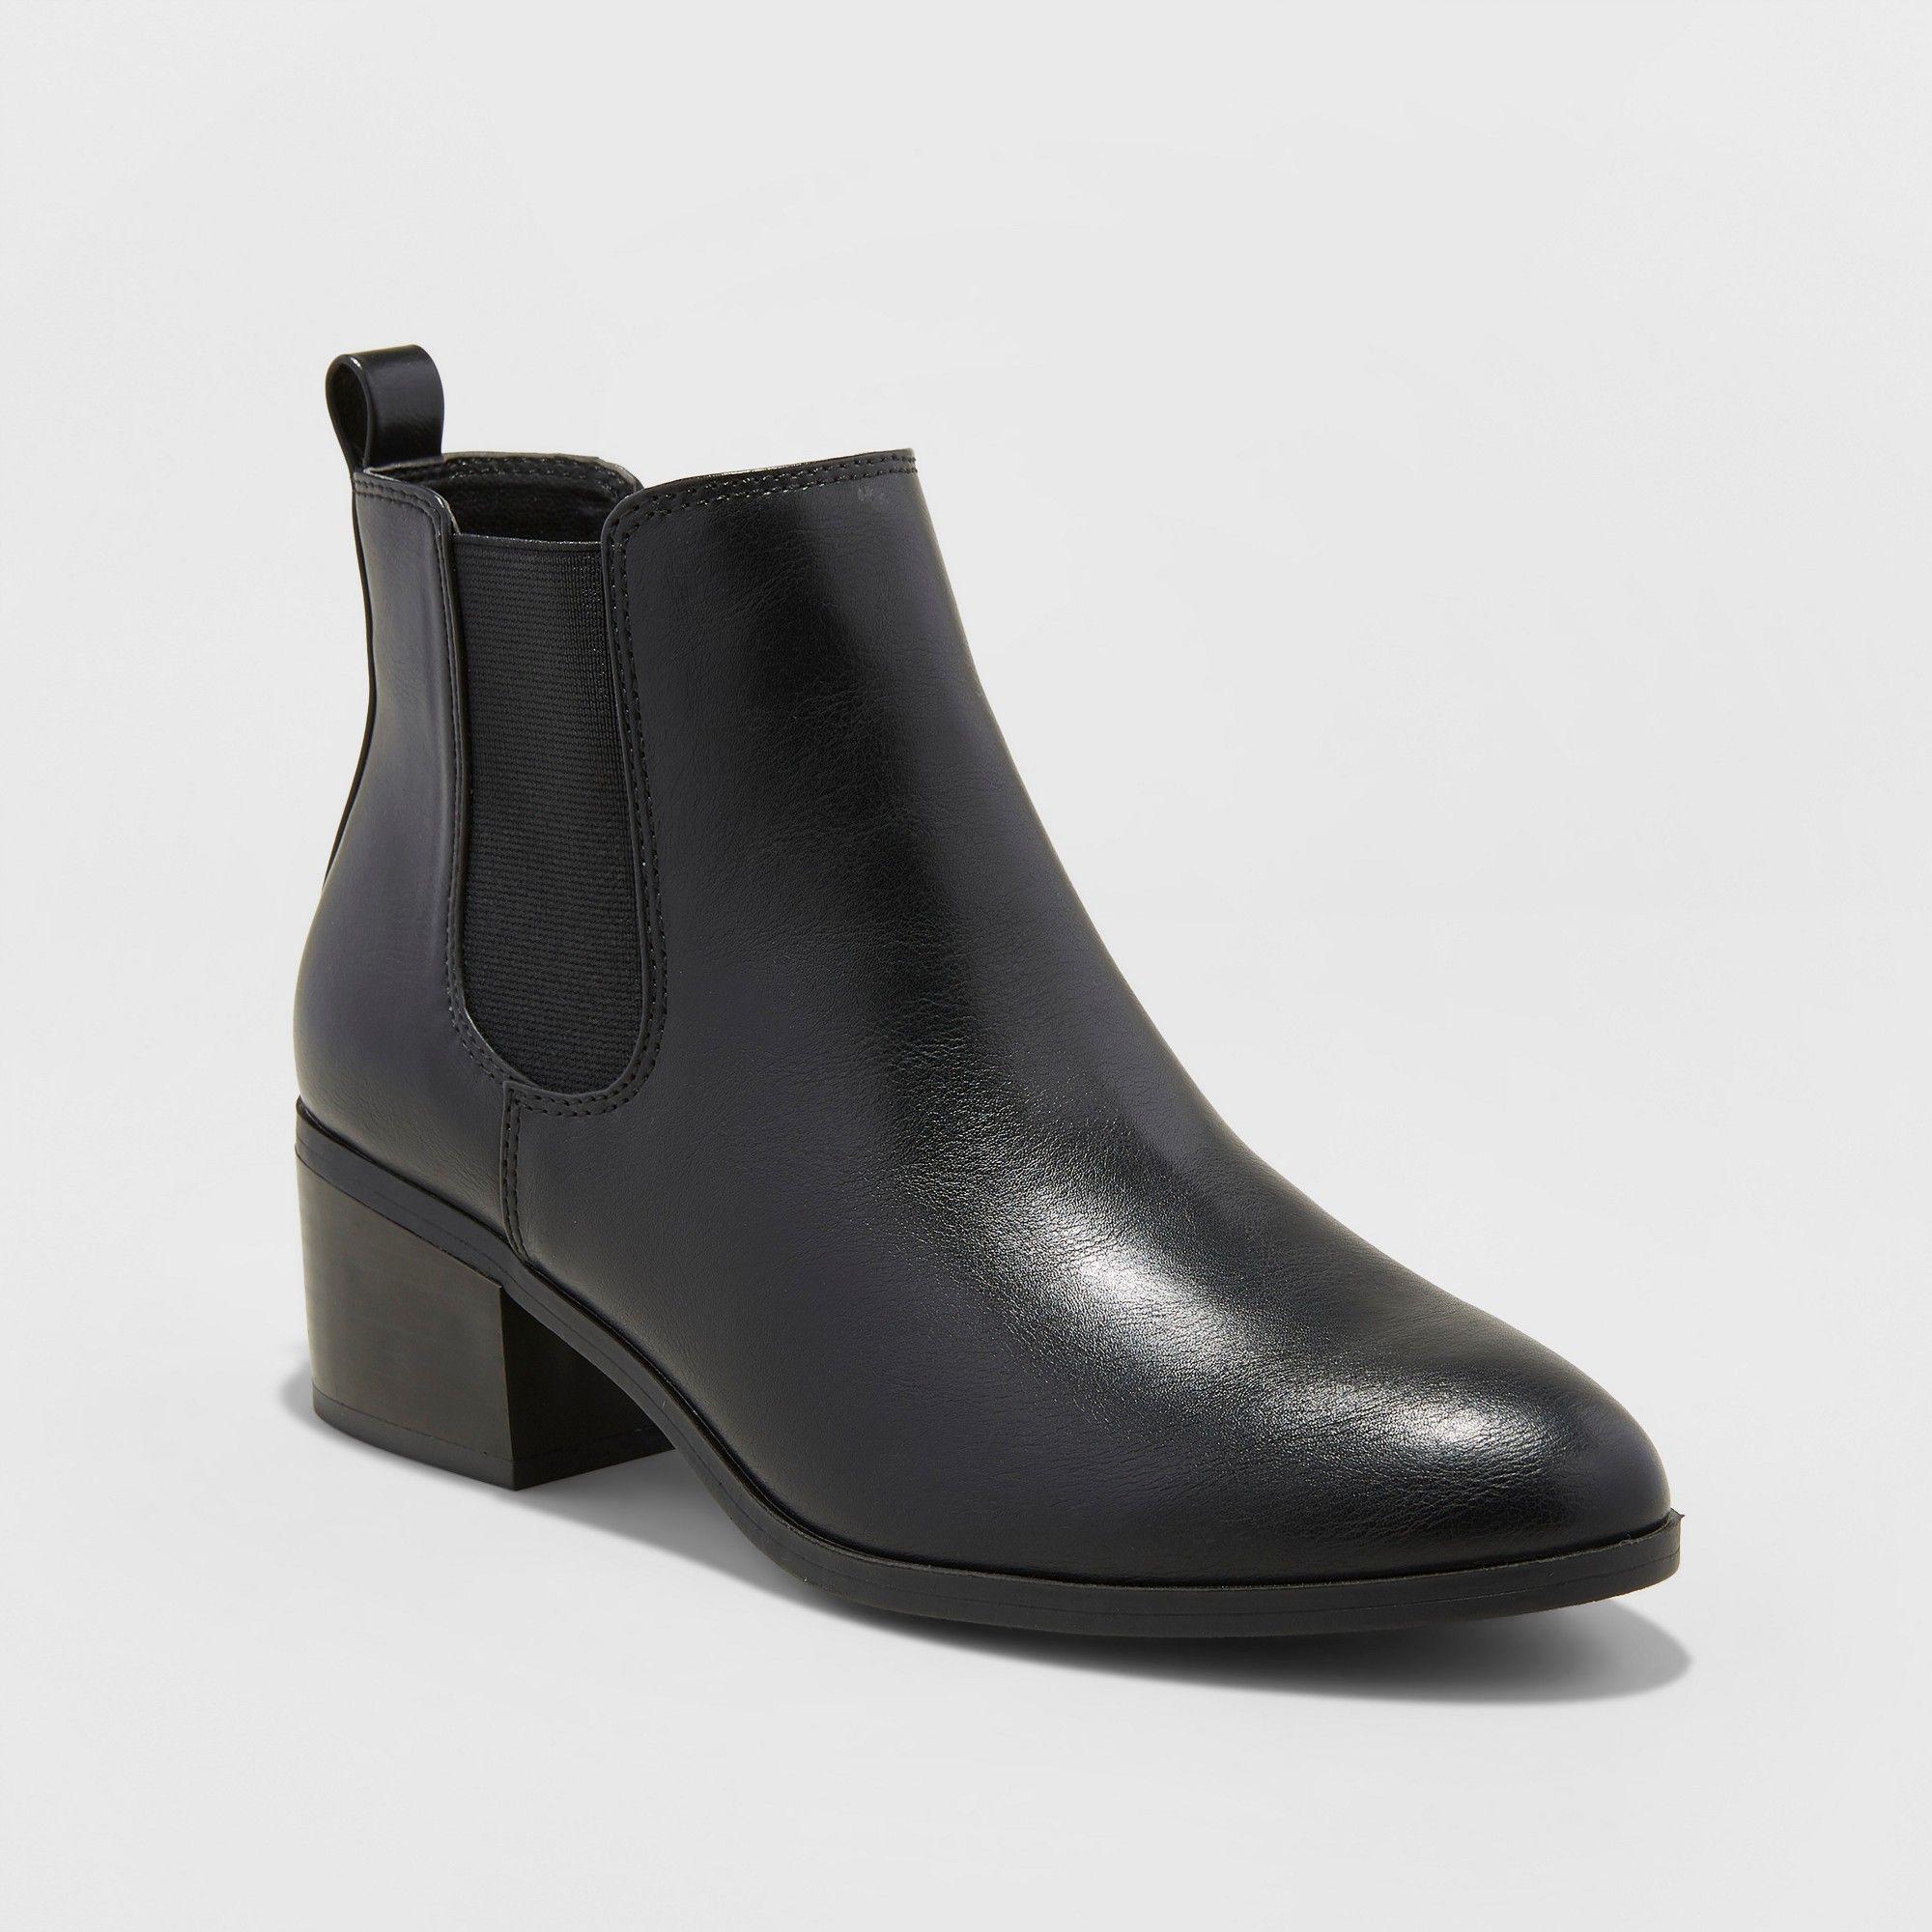 Women s Ellie Wide Width Chelsea Boots - A New Day Black 7.5W, Size  7.5  Wide 8f7fc23527